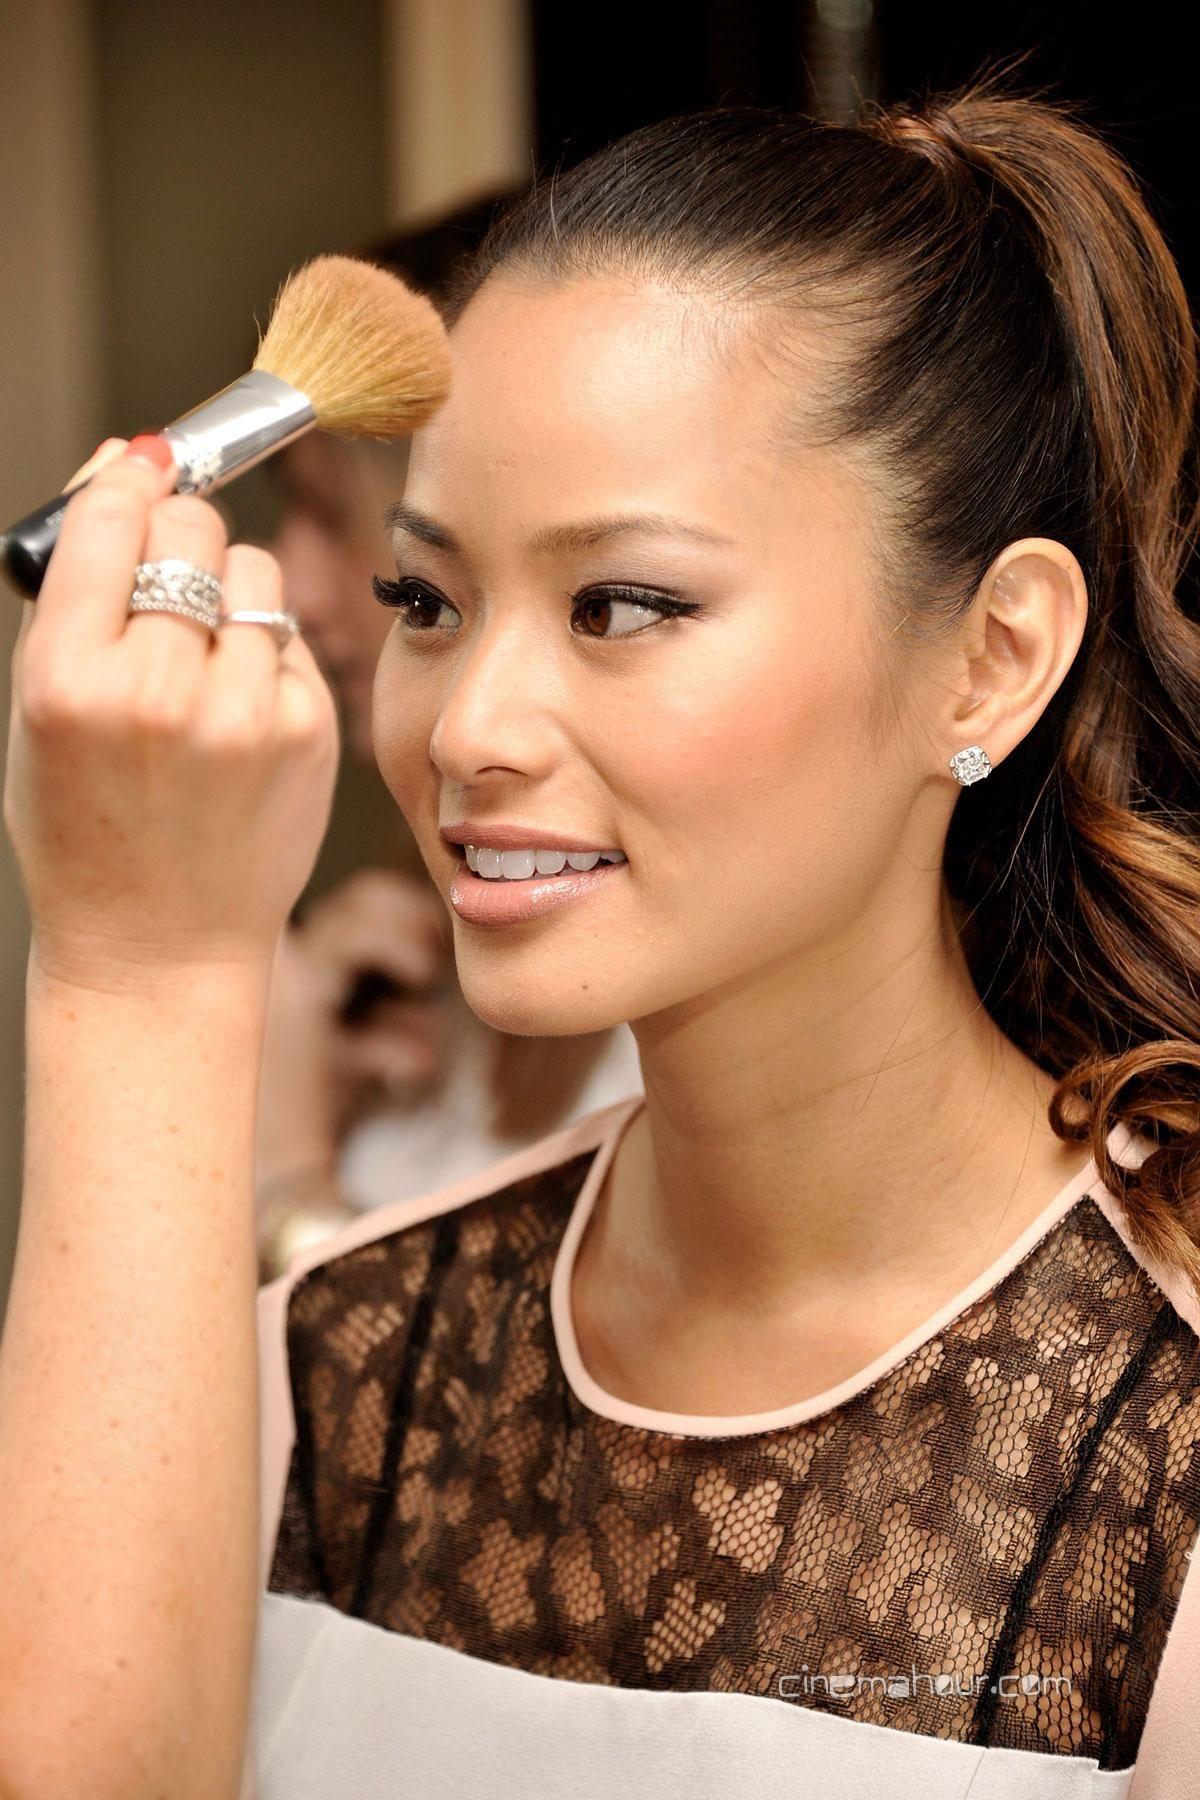 Jamie Chung Scene jamie chung   girls   scene makeup, hair images, jamie chung